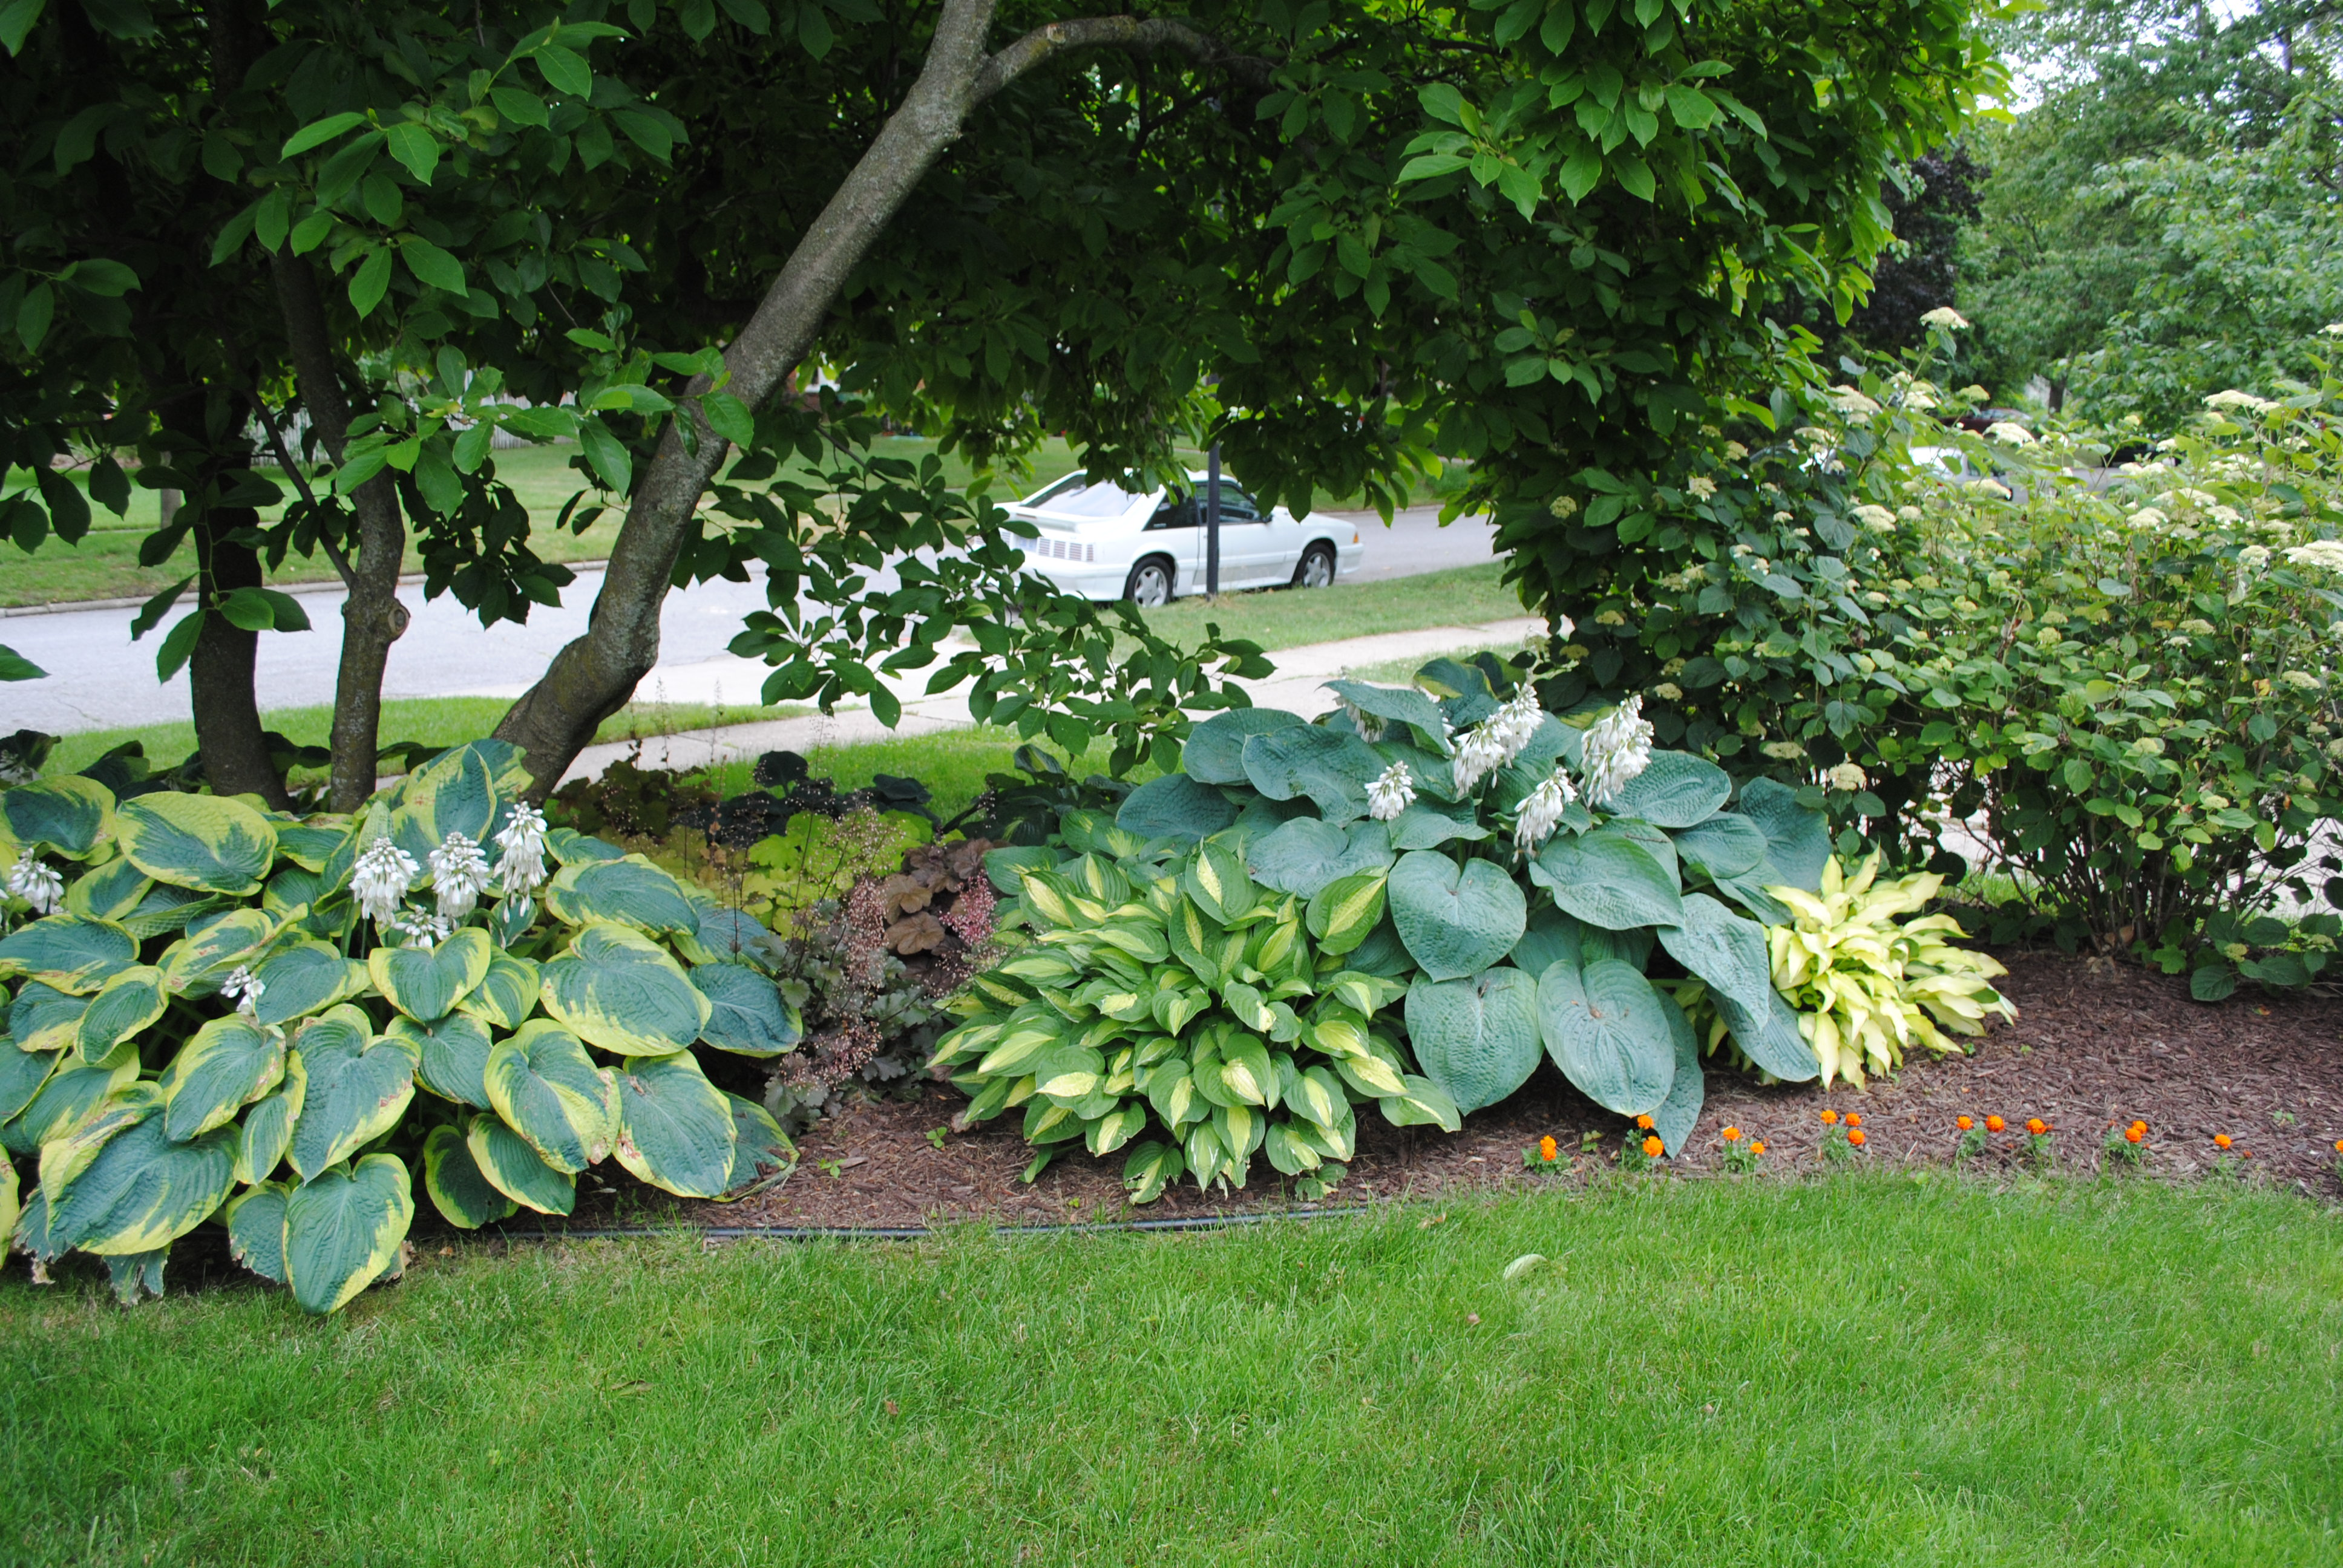 Hostas baby garden337 for Garden under trees